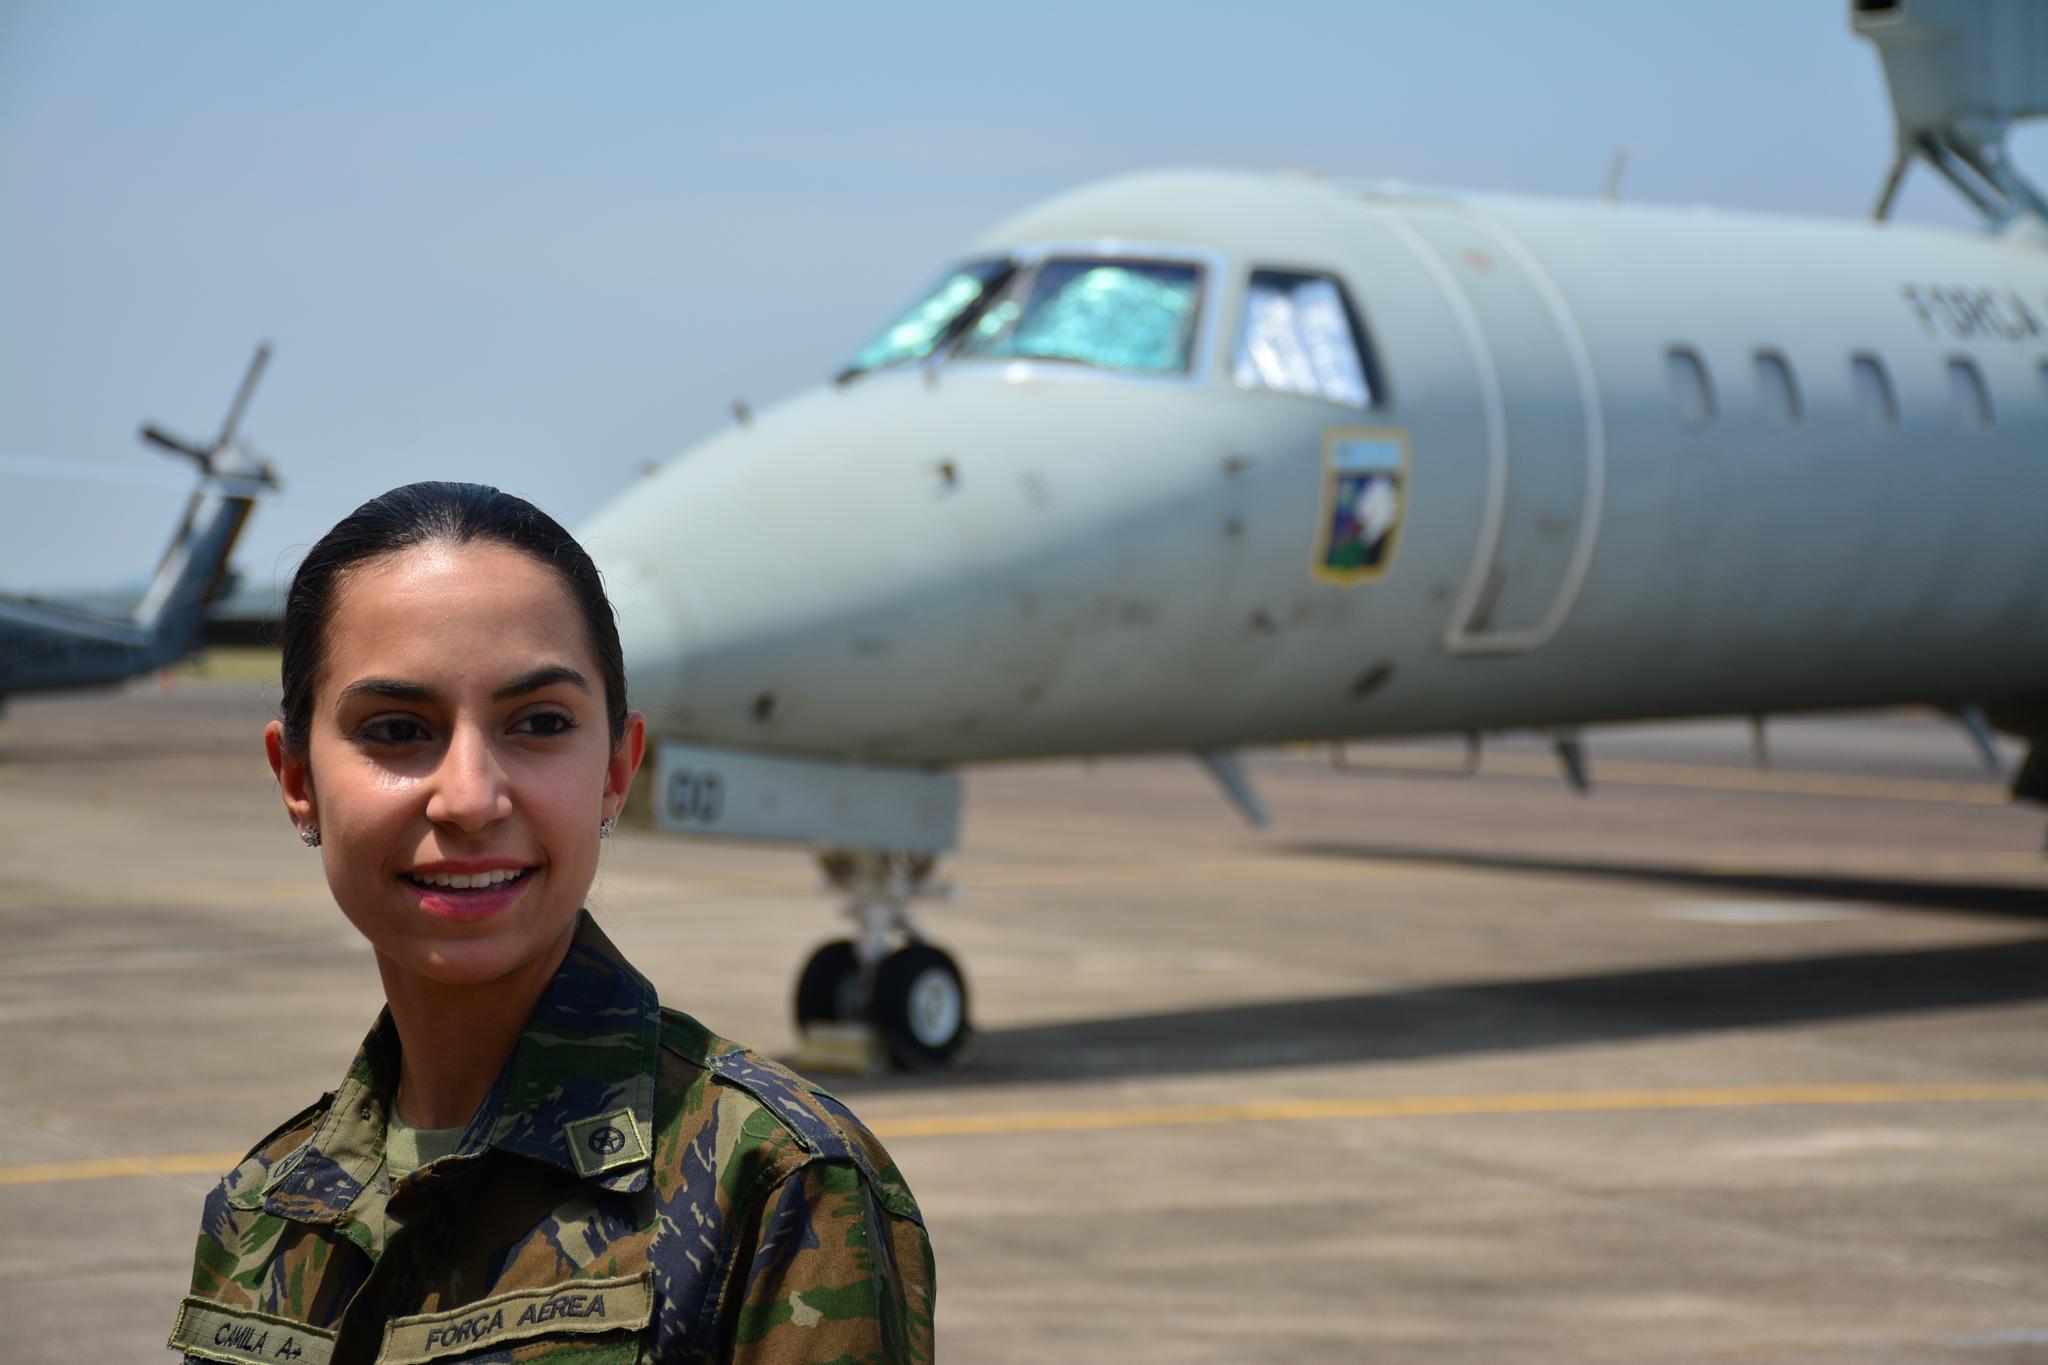 Força Aérea Brasileira by Wilton Esteves